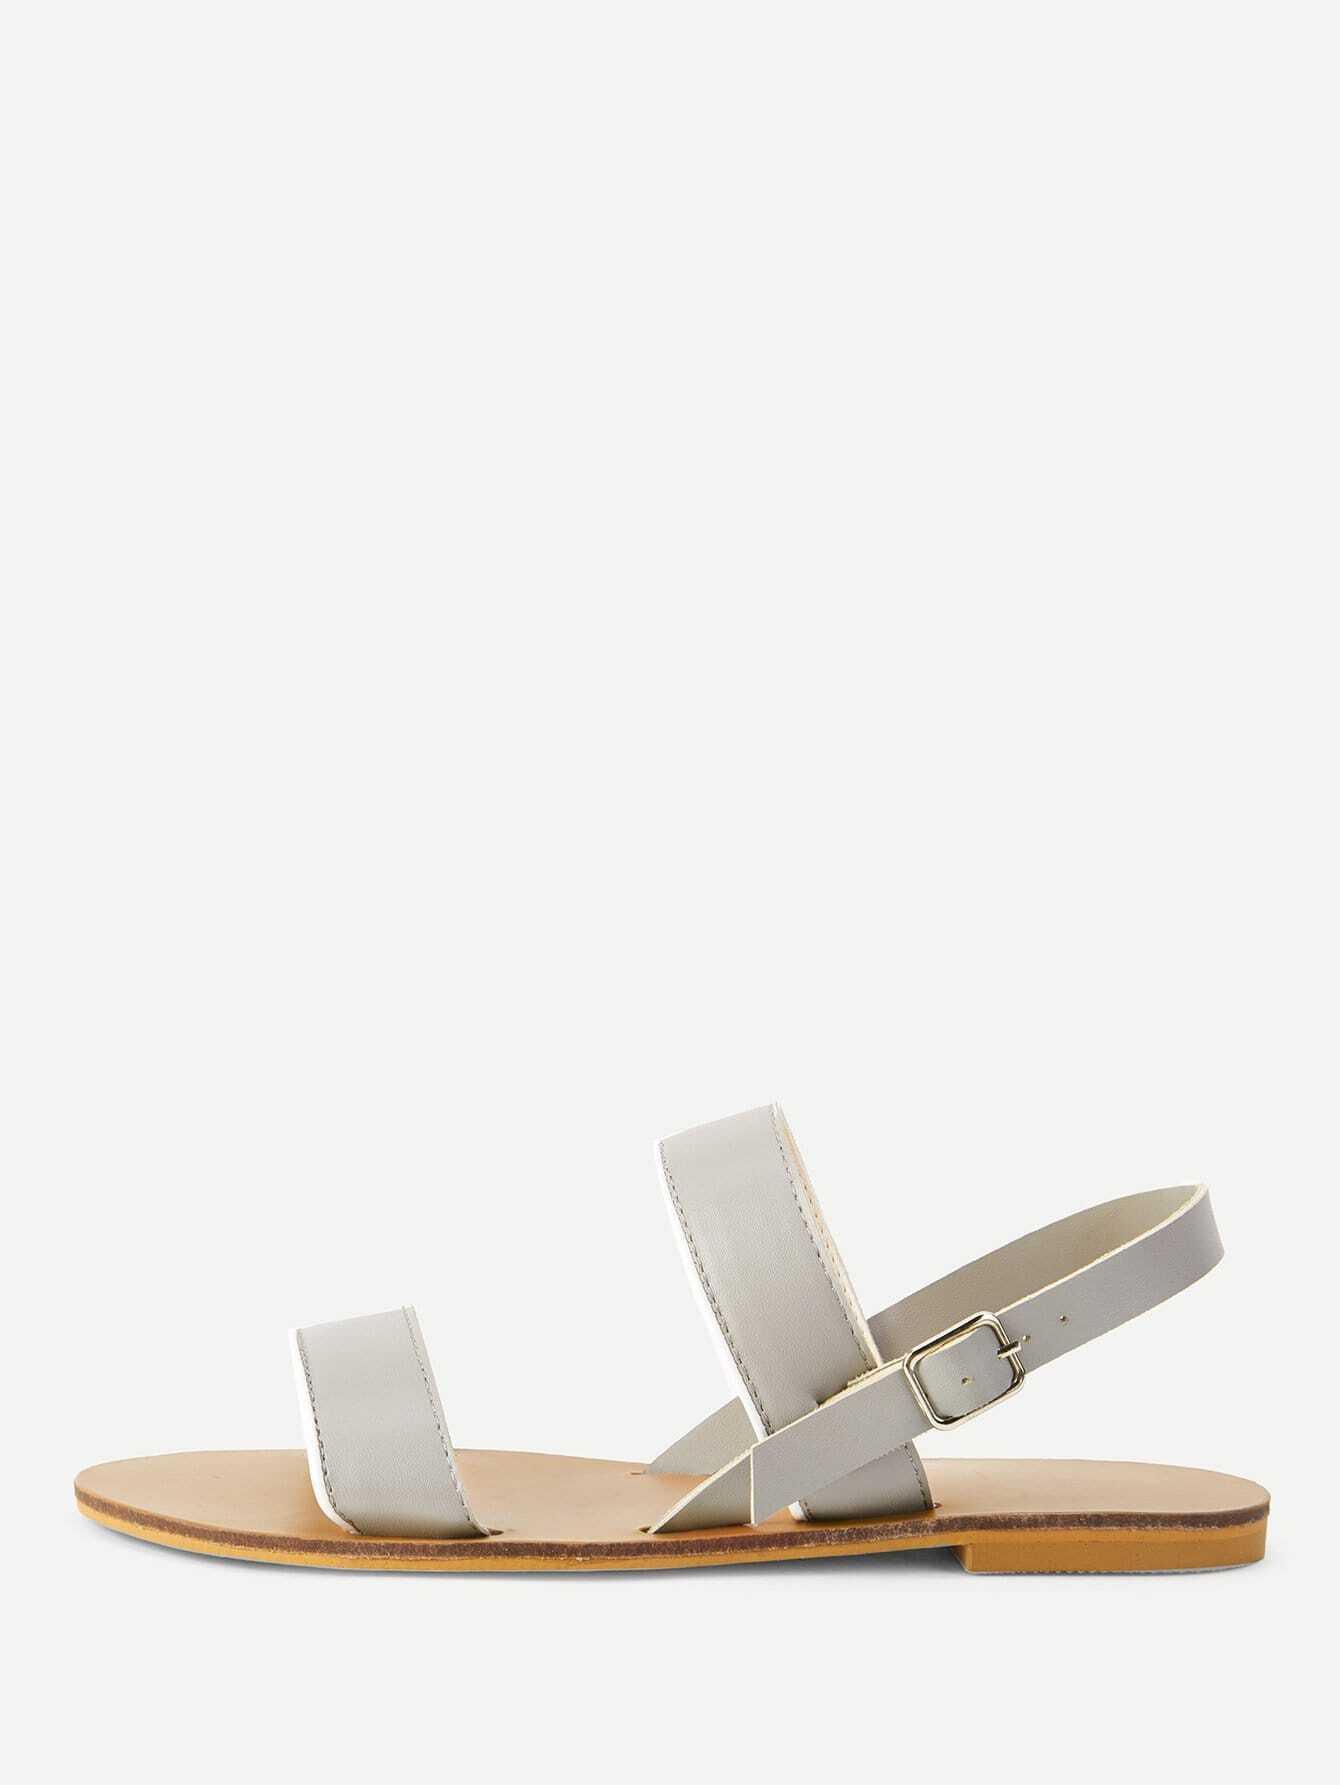 Strappy Design Flat Sandals metallic strappy flat sandals